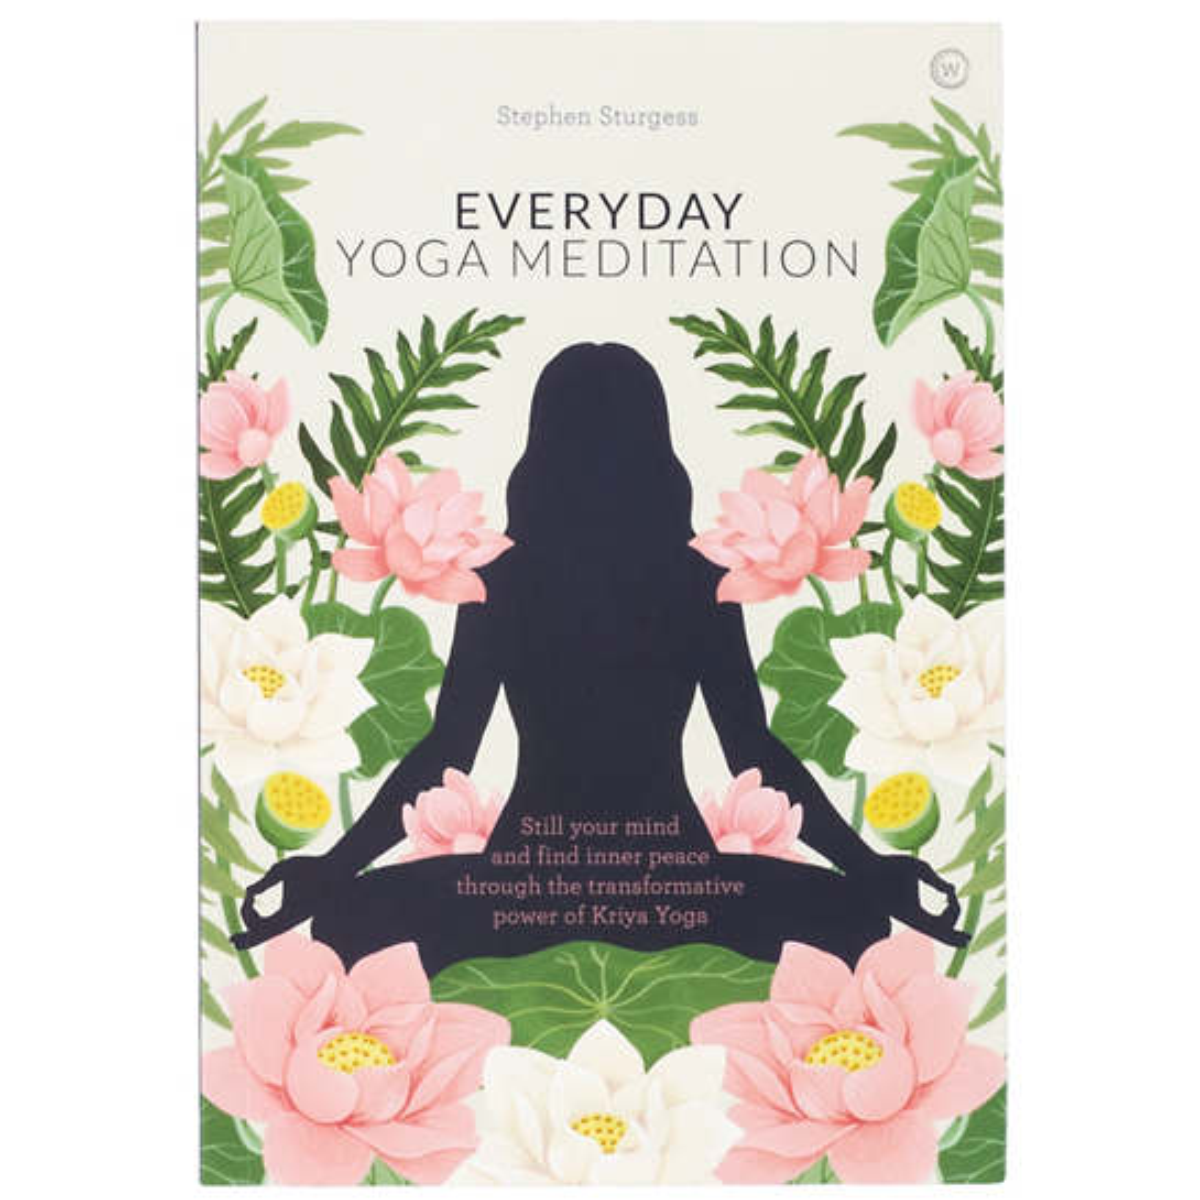 Everyday Yoga Meditation: Still Your Mind And Find Inner Peace Through The Transformative Power Of Kriya Yoga Book